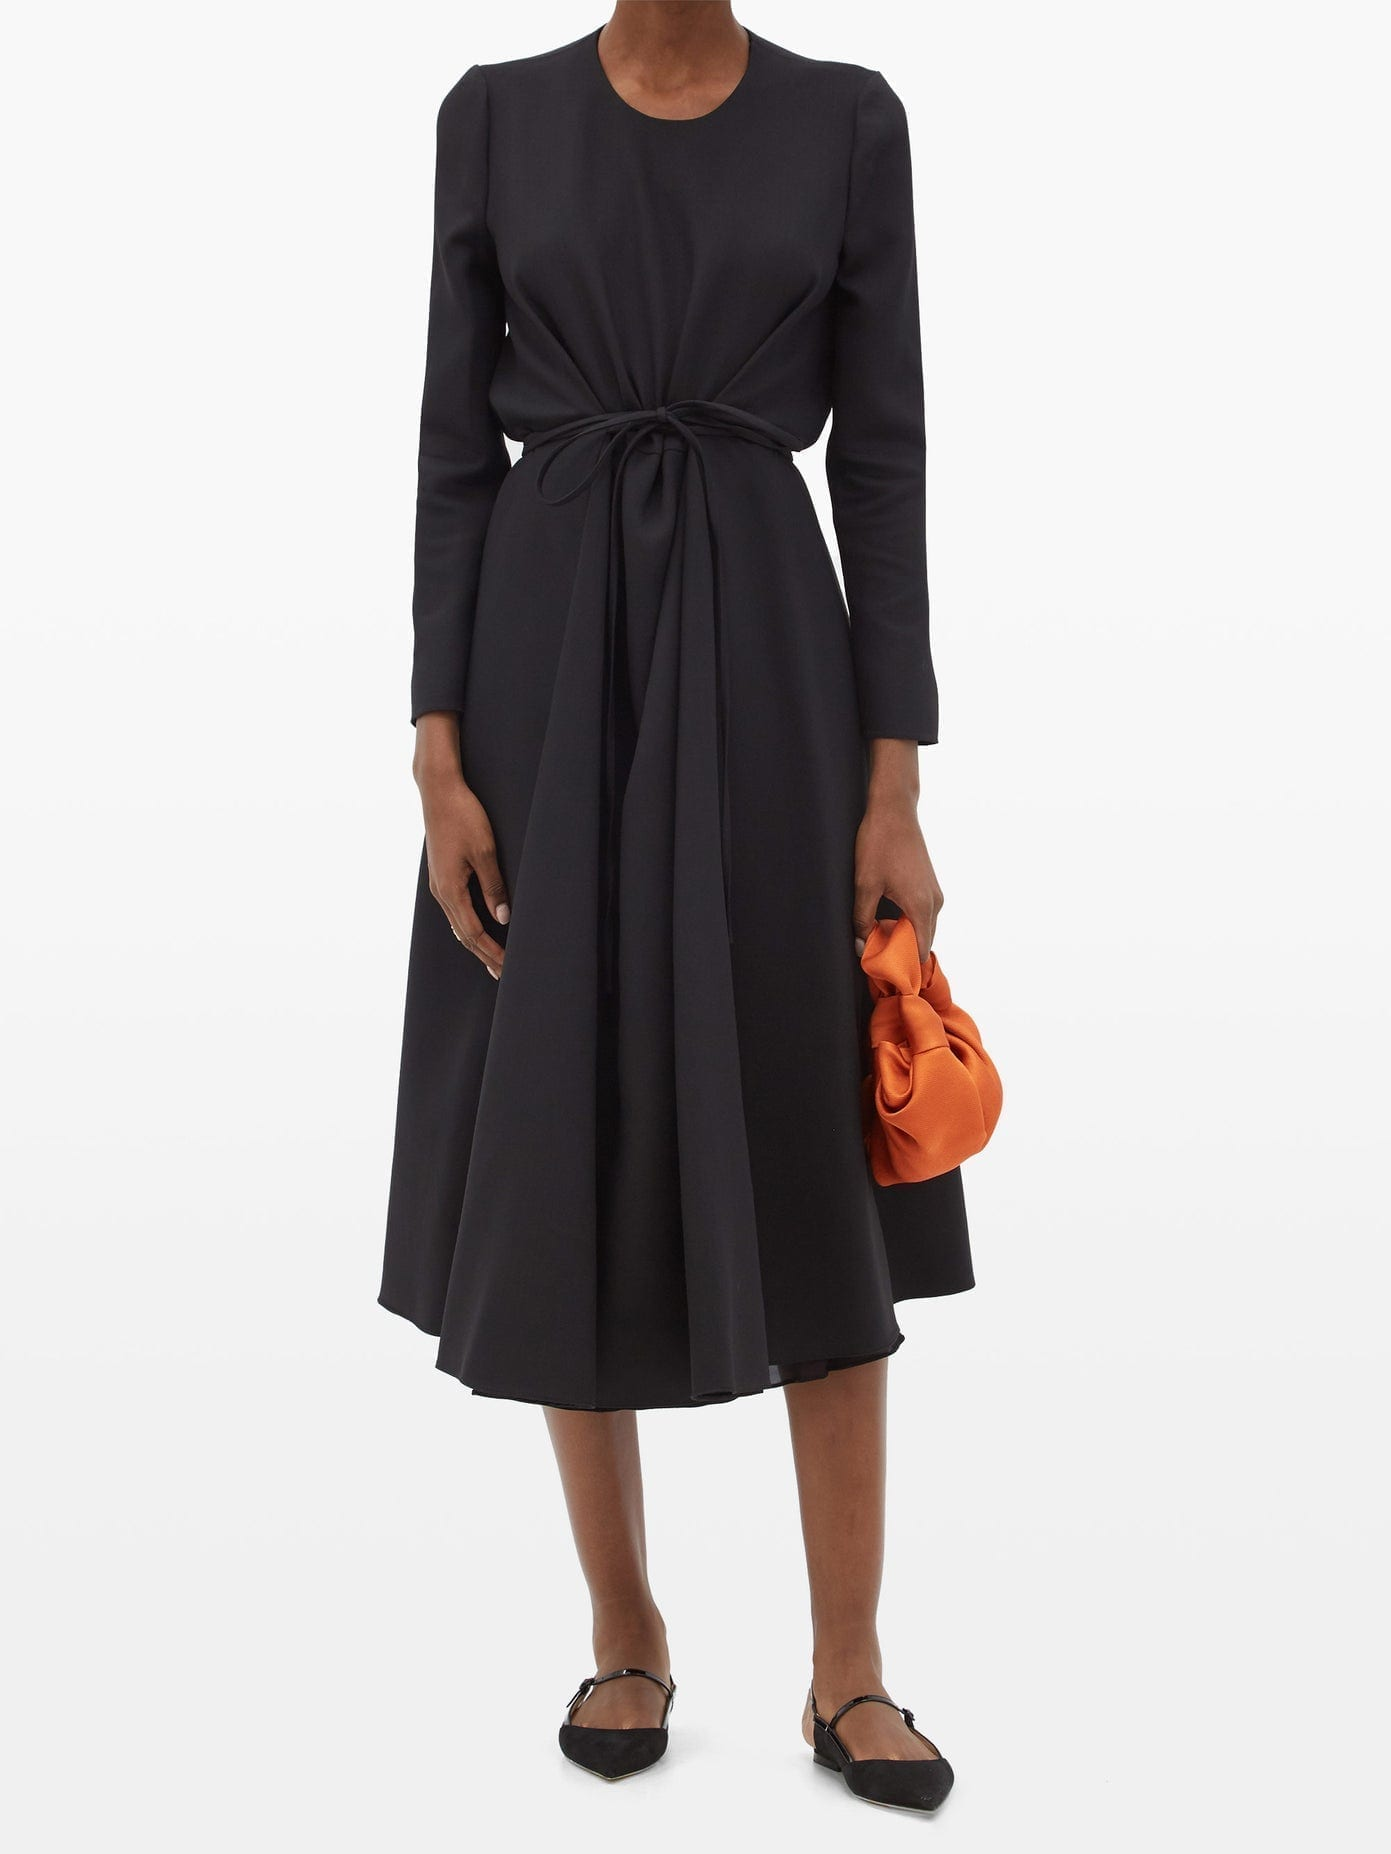 VALENTINO Tie-waist Wool-blend Crepe Dress